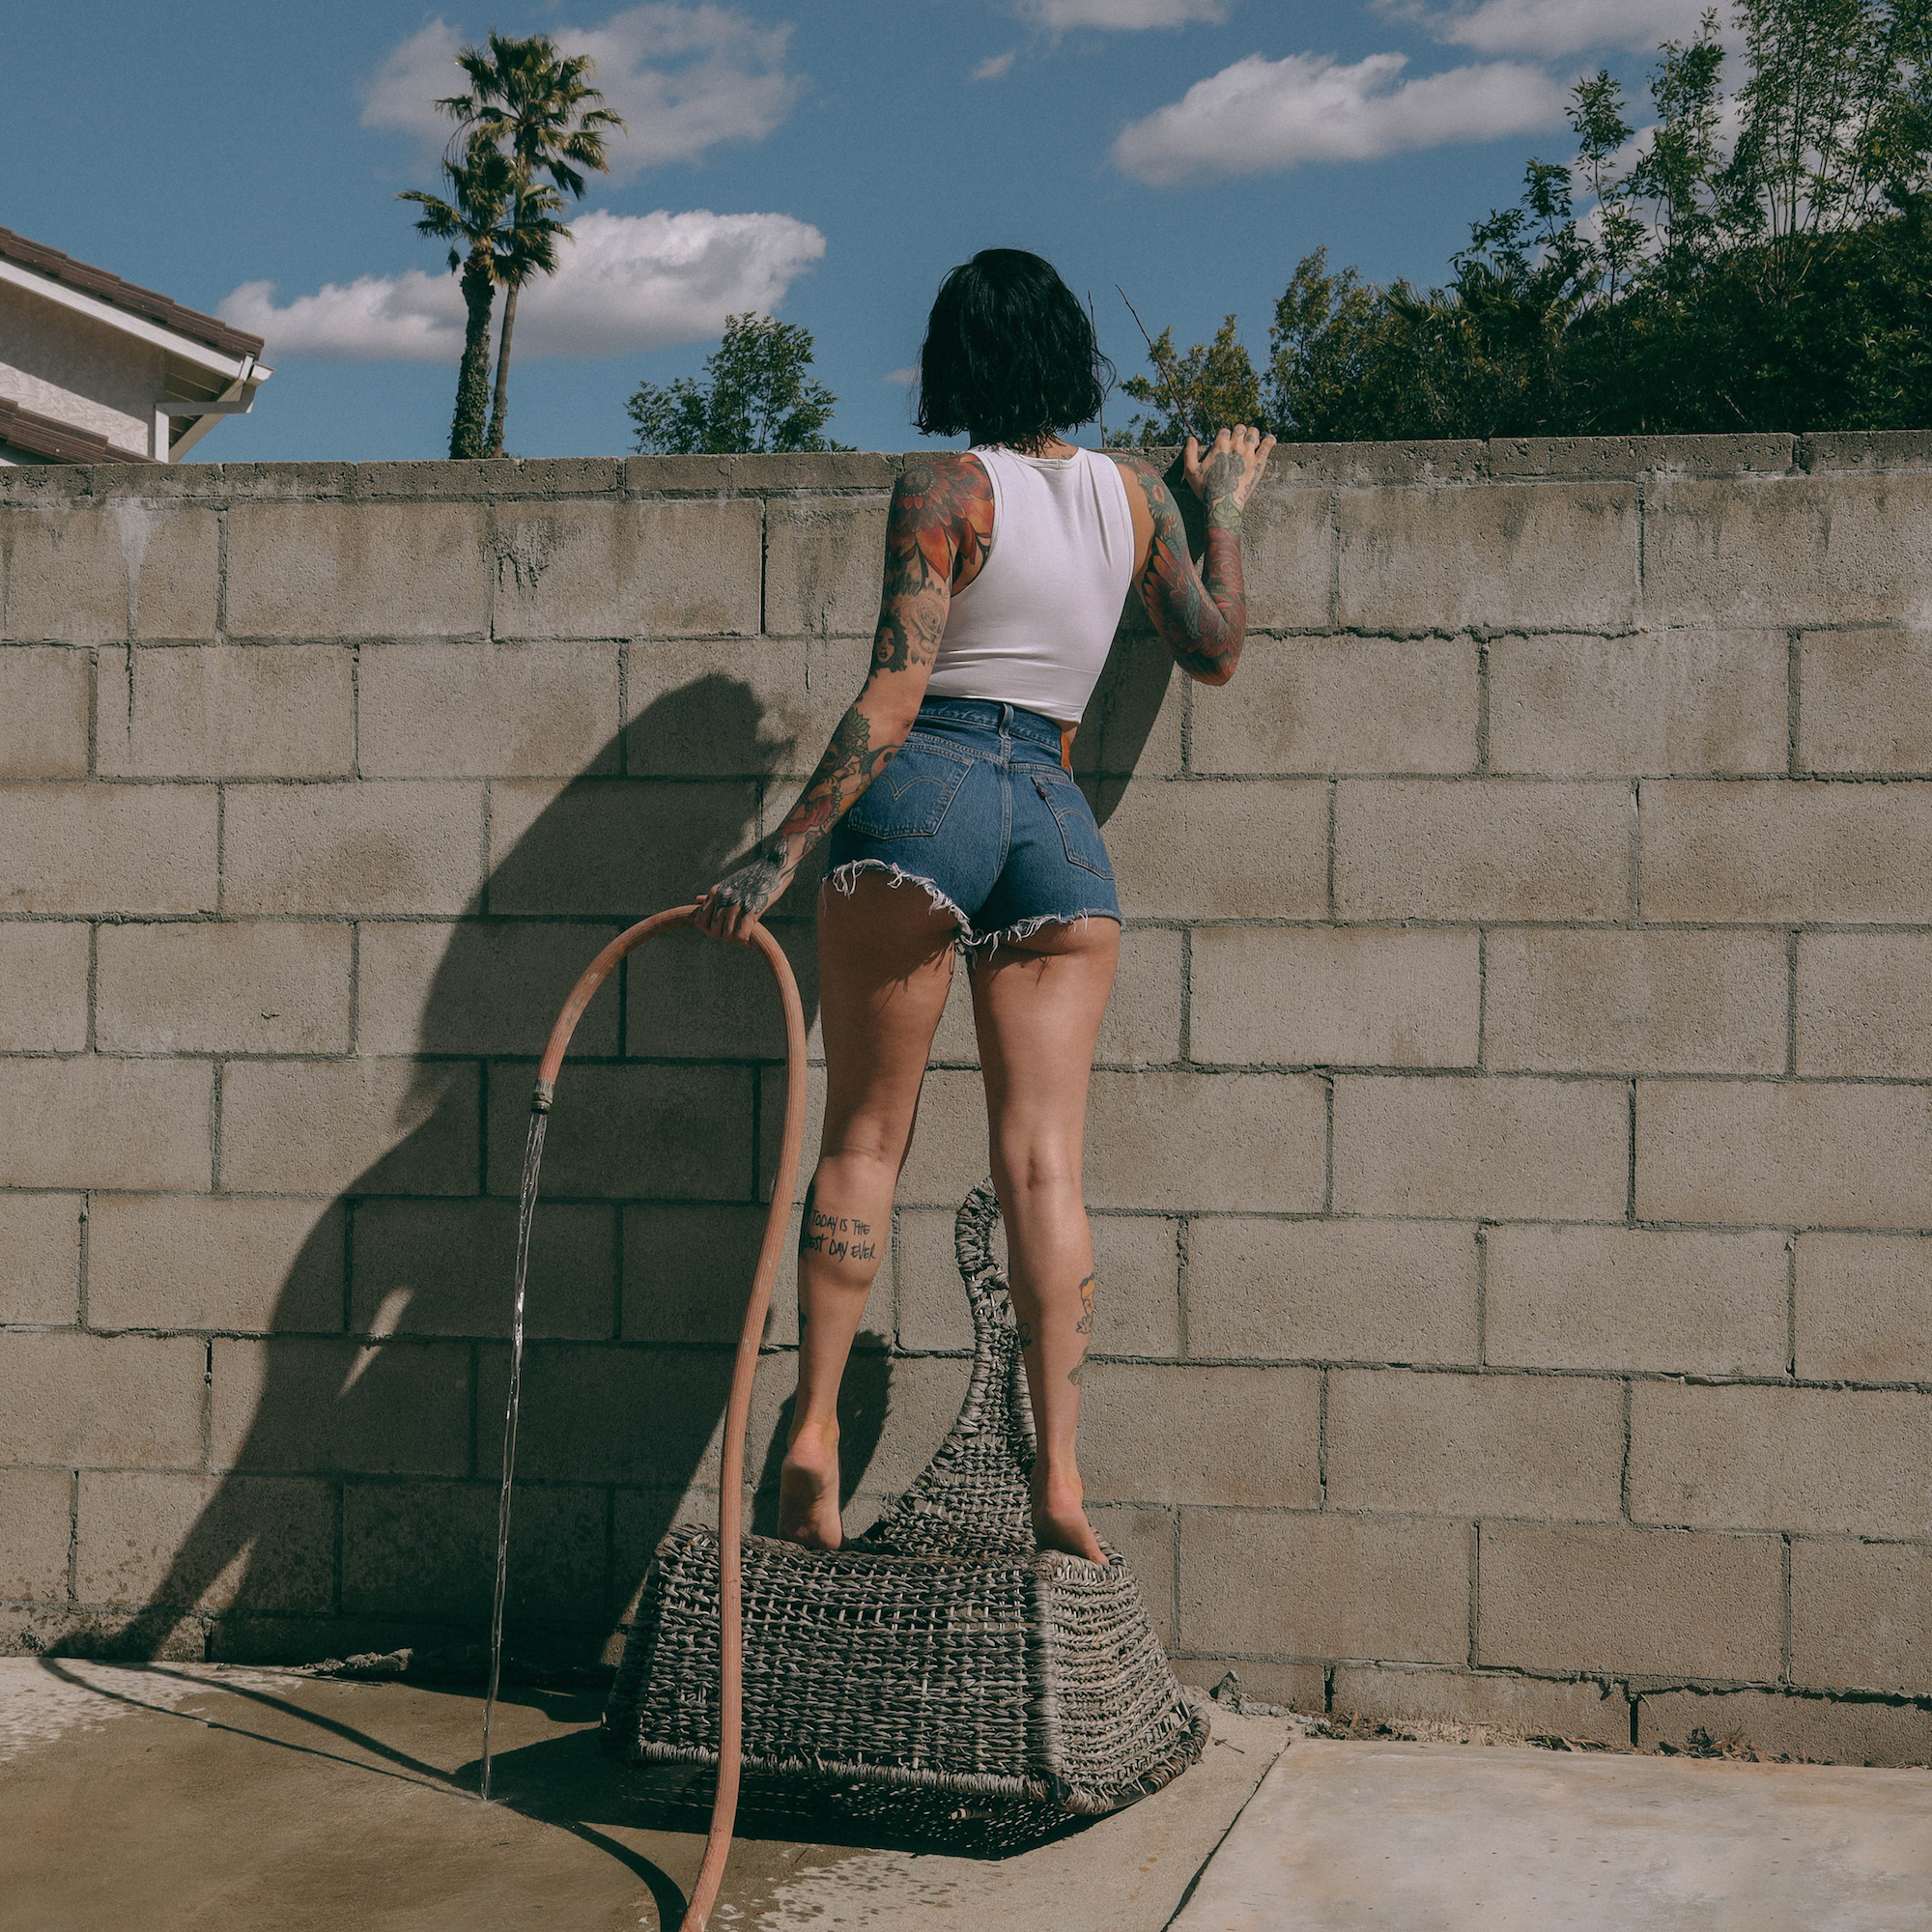 Kehlani_It-Was-Good-Until-It-Wasnt-Final-Artwork_NO-PA